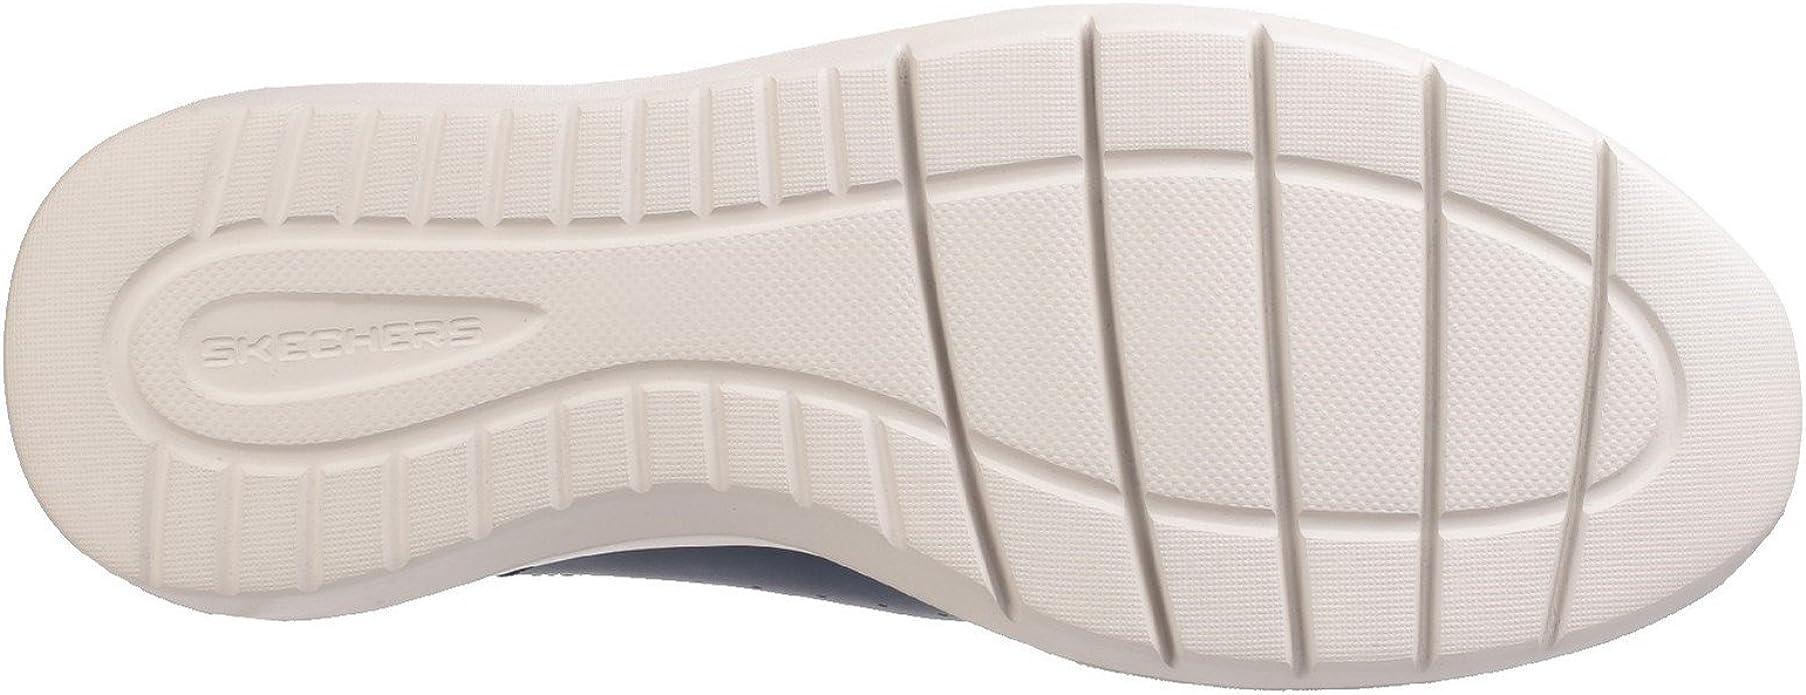 Foreflex lace up athletic walking